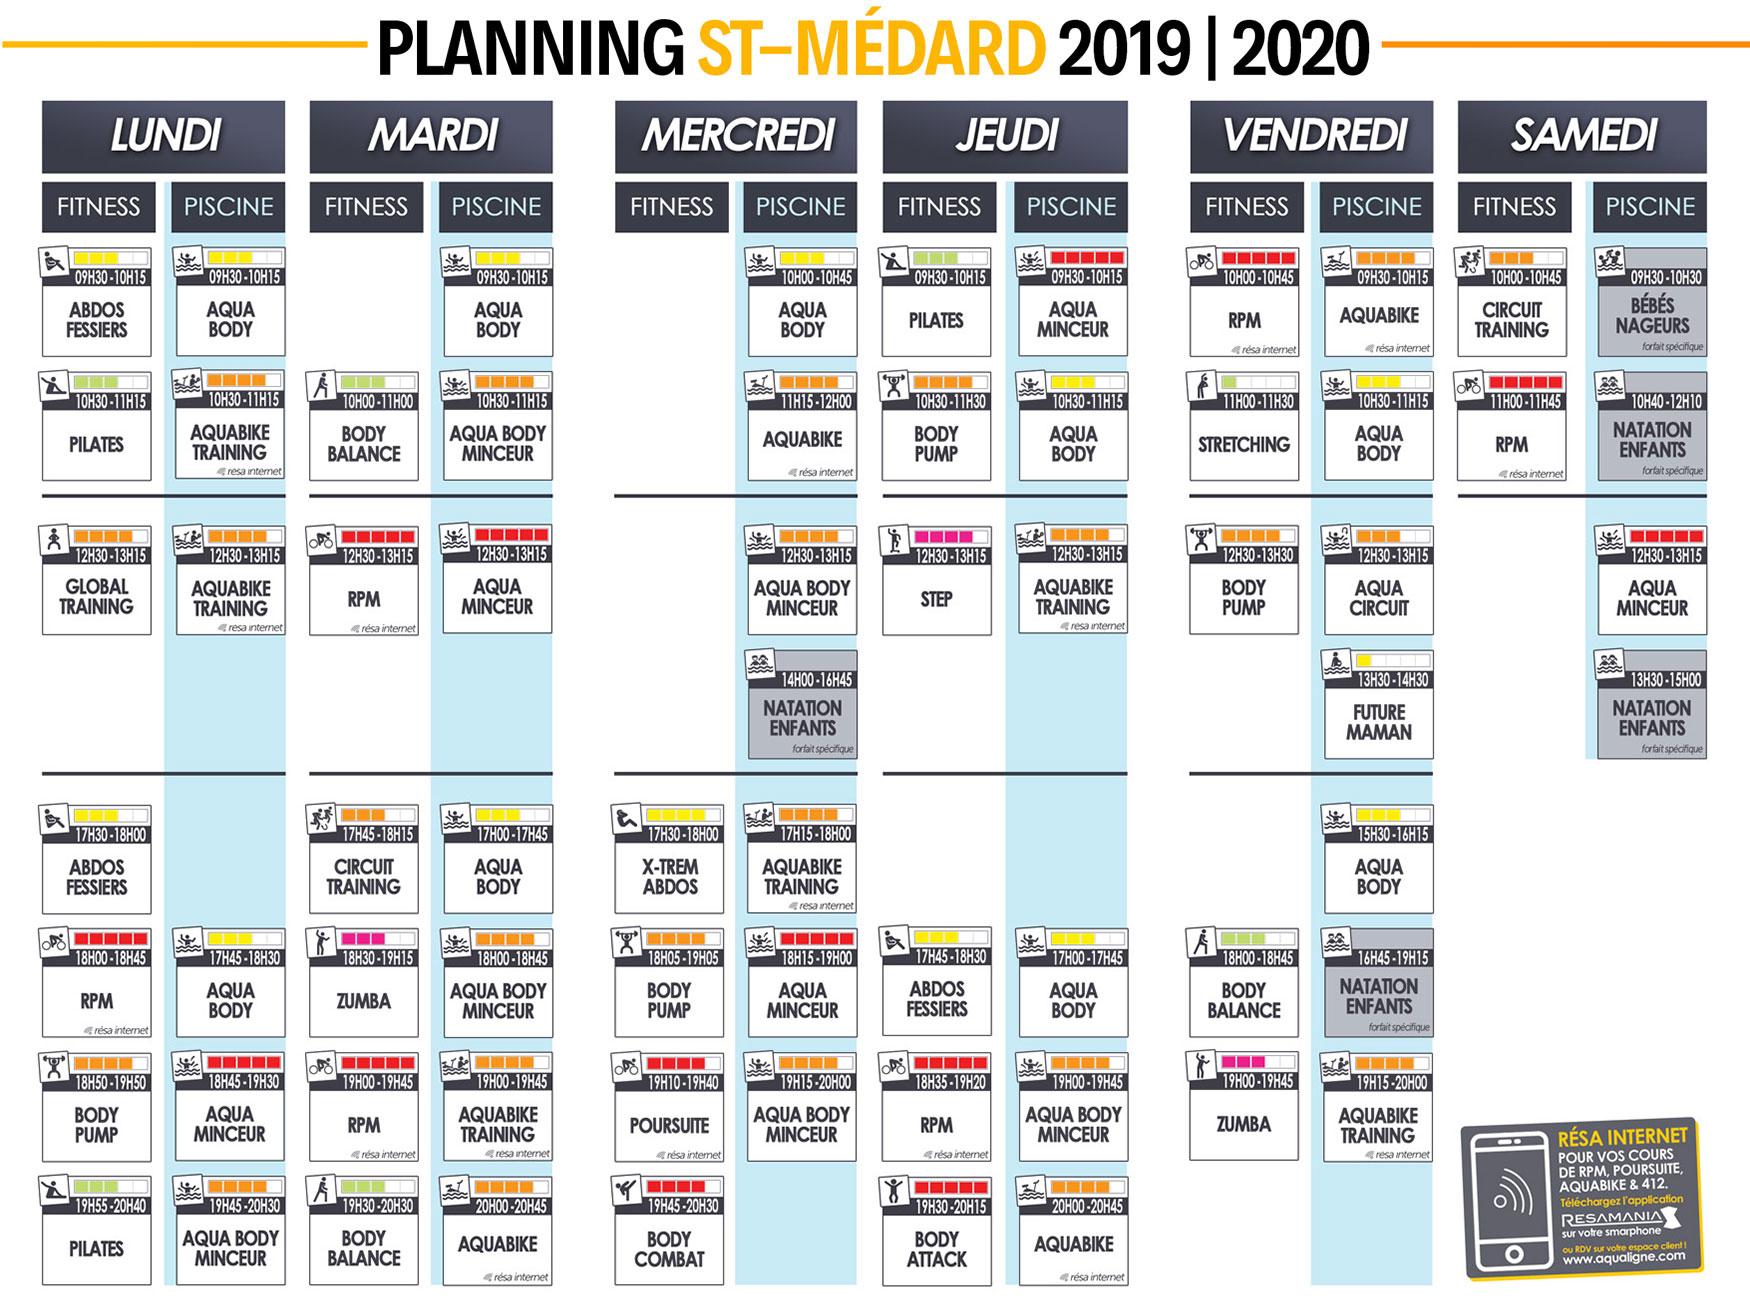 ST-MEDARD-EN-JALLES-Planning-2019-20